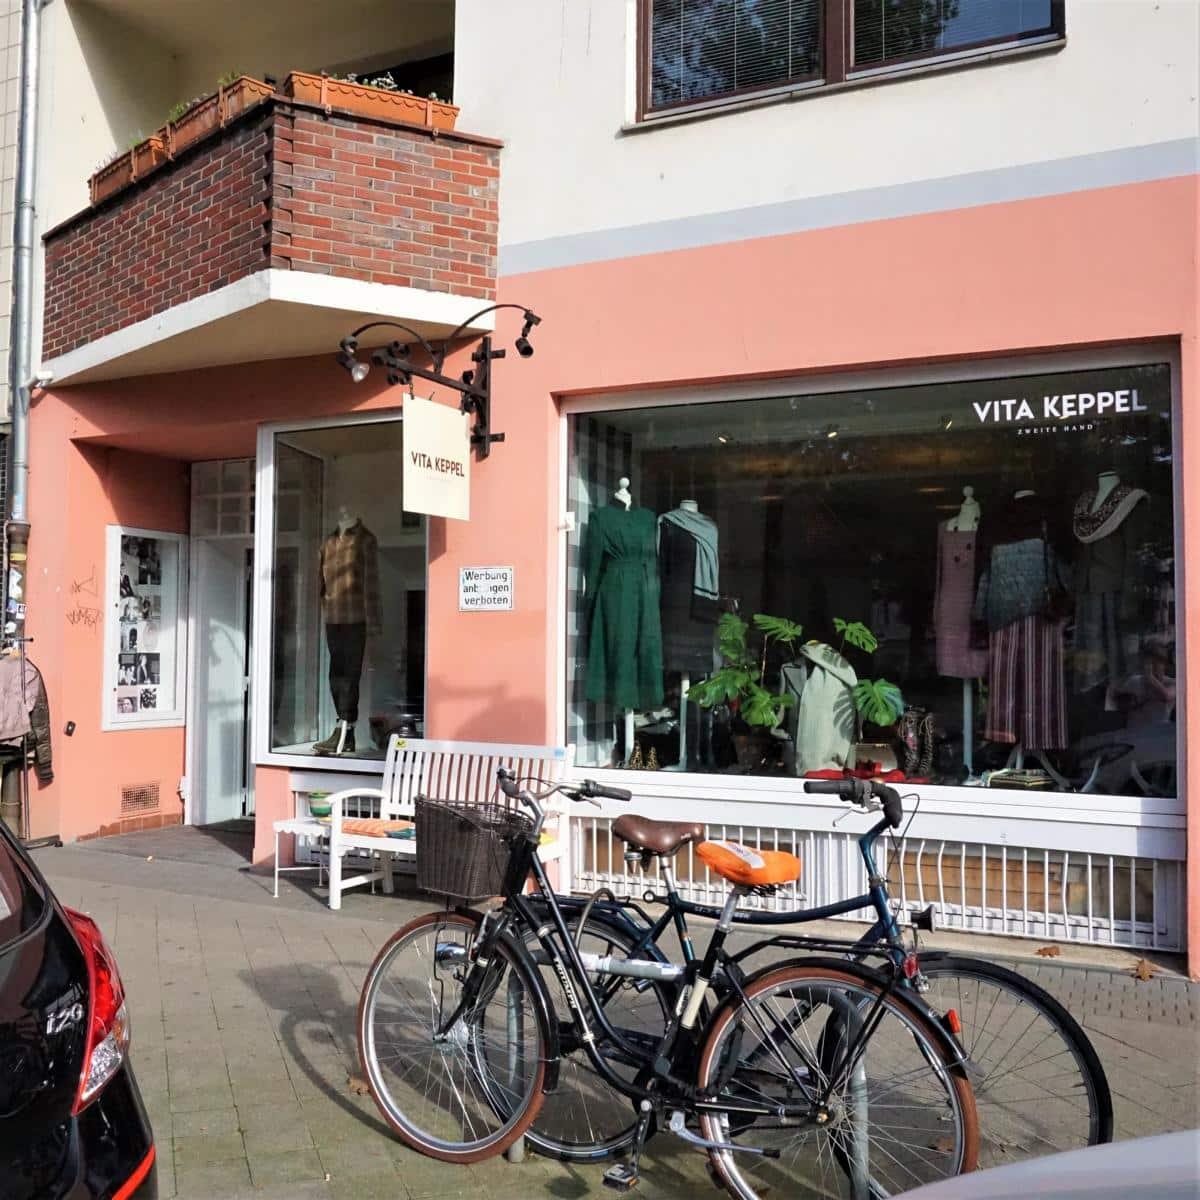 Style Hannover Vita Keppel 2 - Vita Keppel: Hier können KundInnen kaufen – und verkaufen